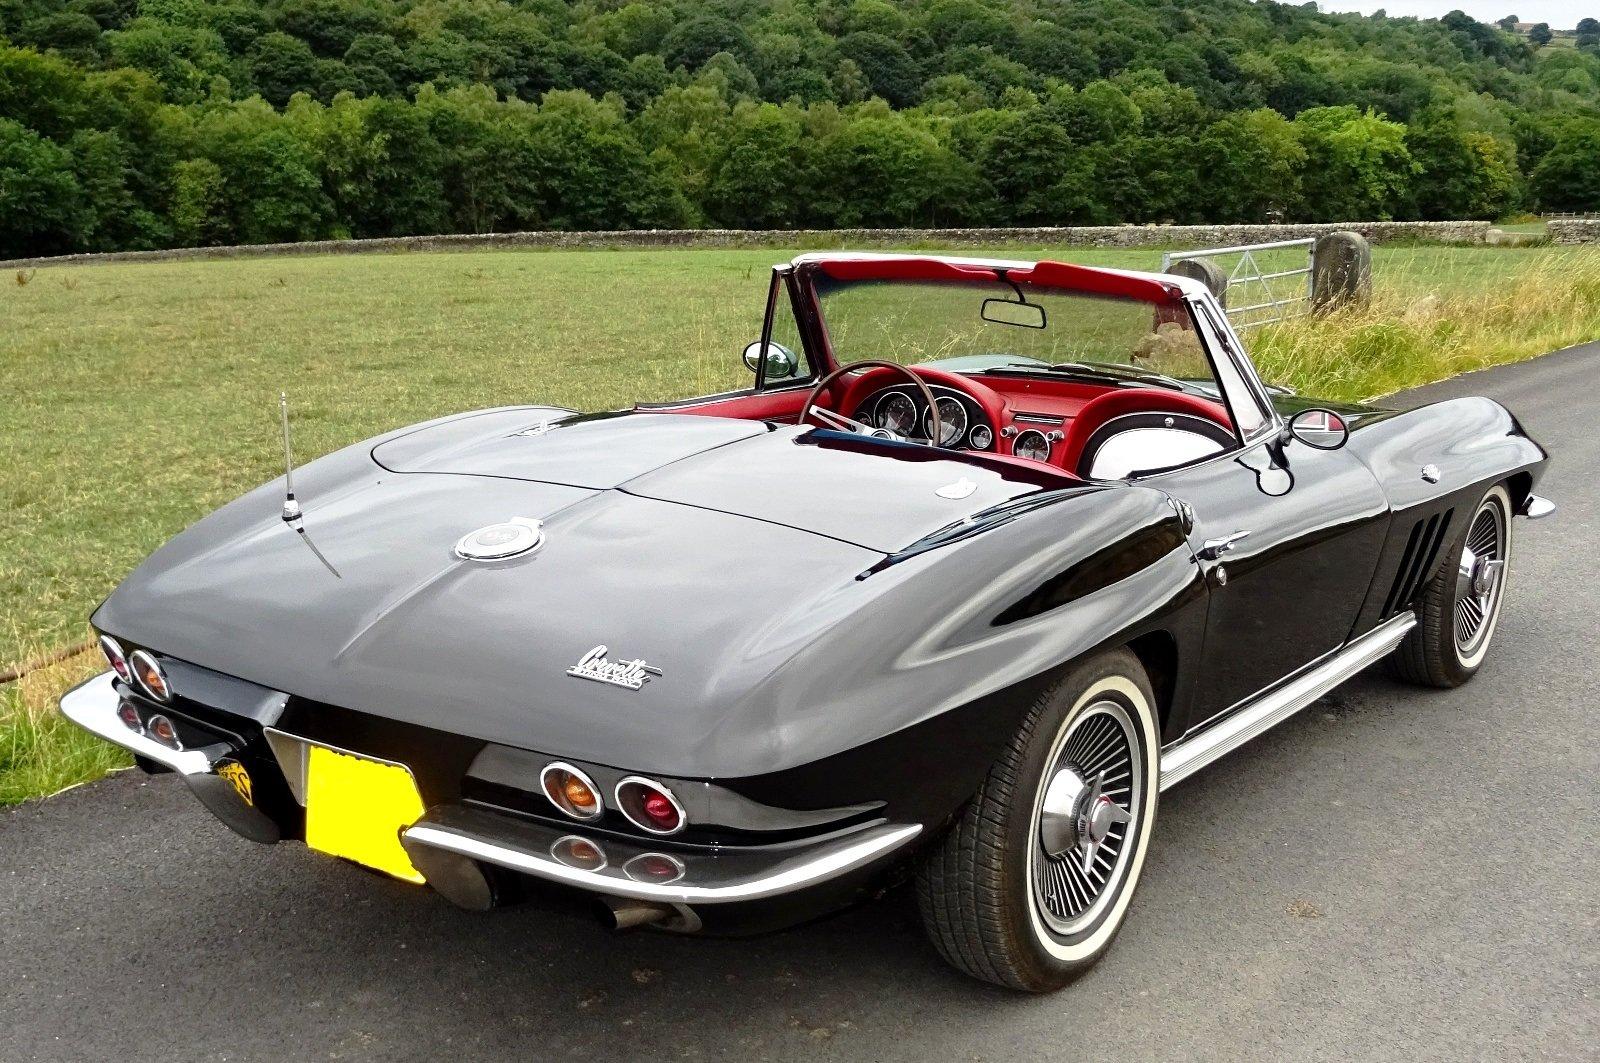 1966 CHEVROLET CORVETTE STINGRAY BEAUTIFUL MUSCLE CAR For ...